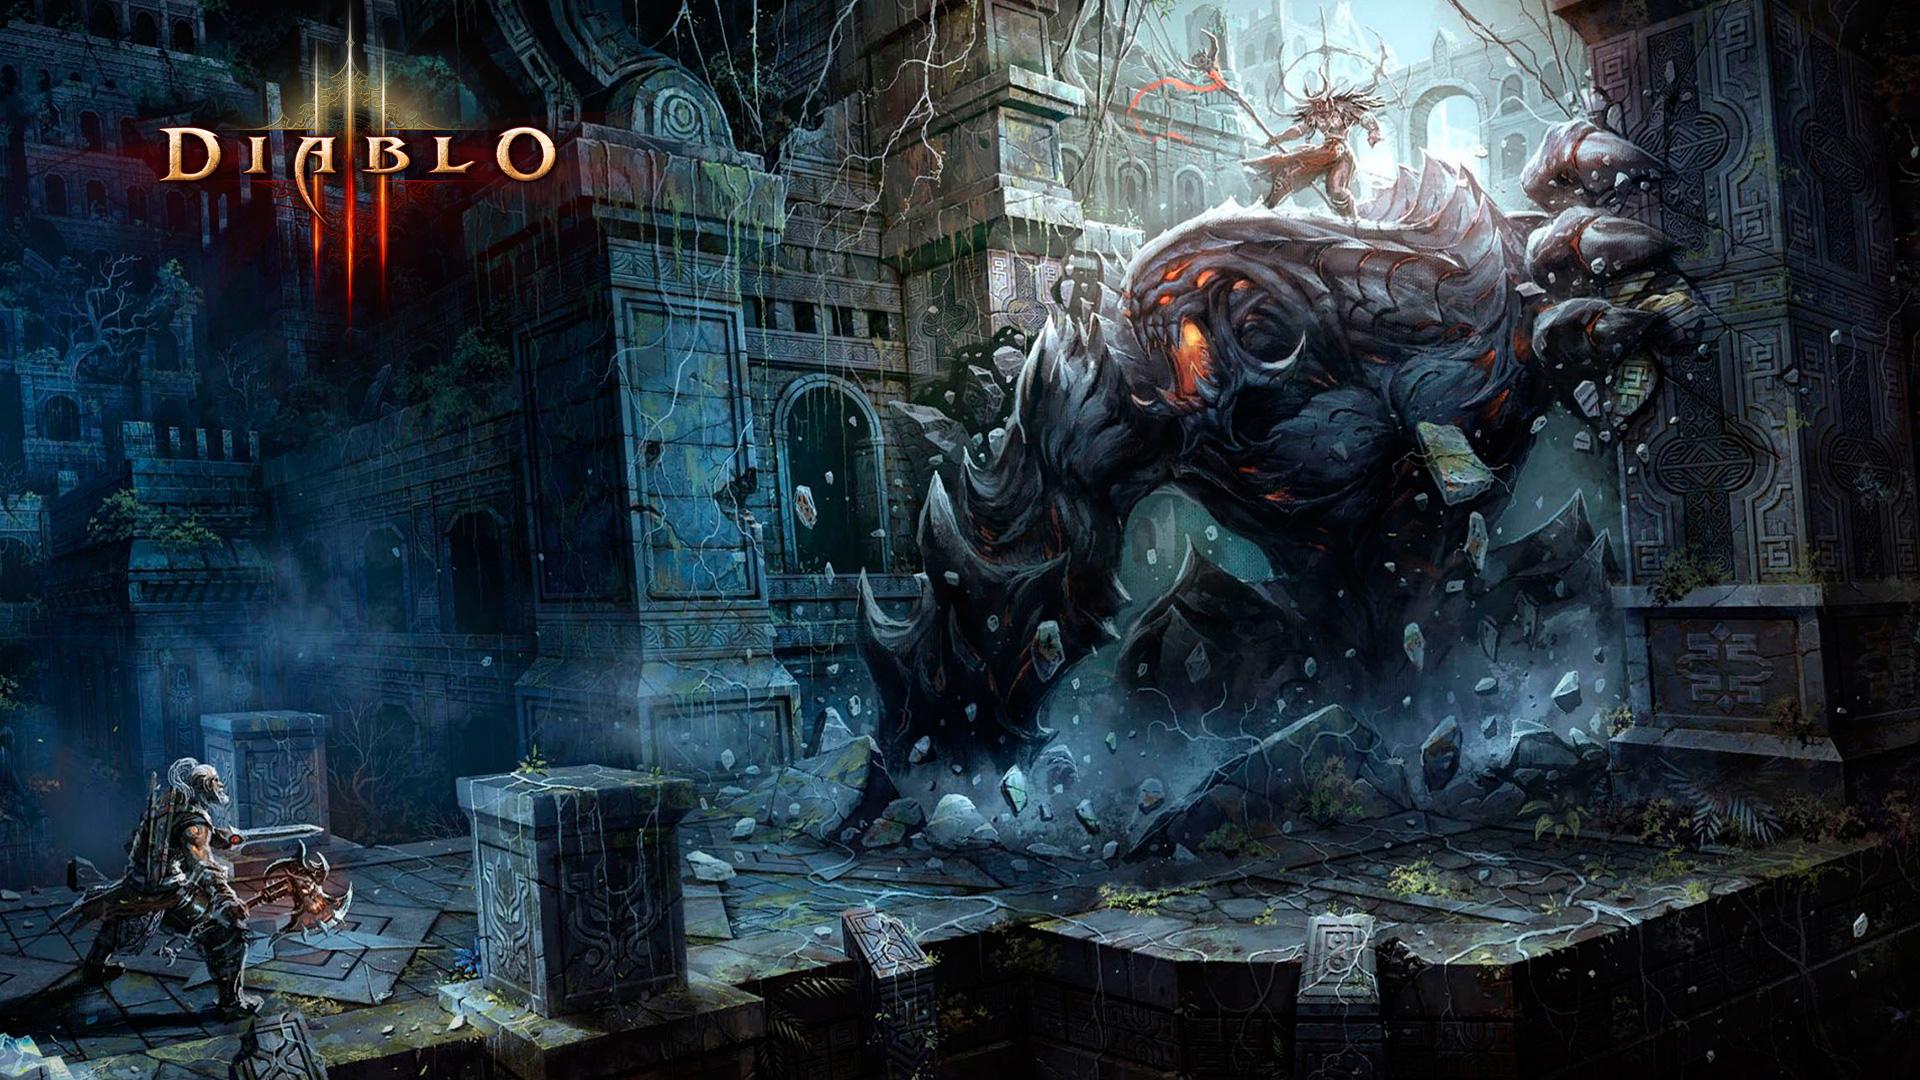 Diablo 3 Wallpaper 1920x1080: Diablo 3 Wallpaper 1920x1080